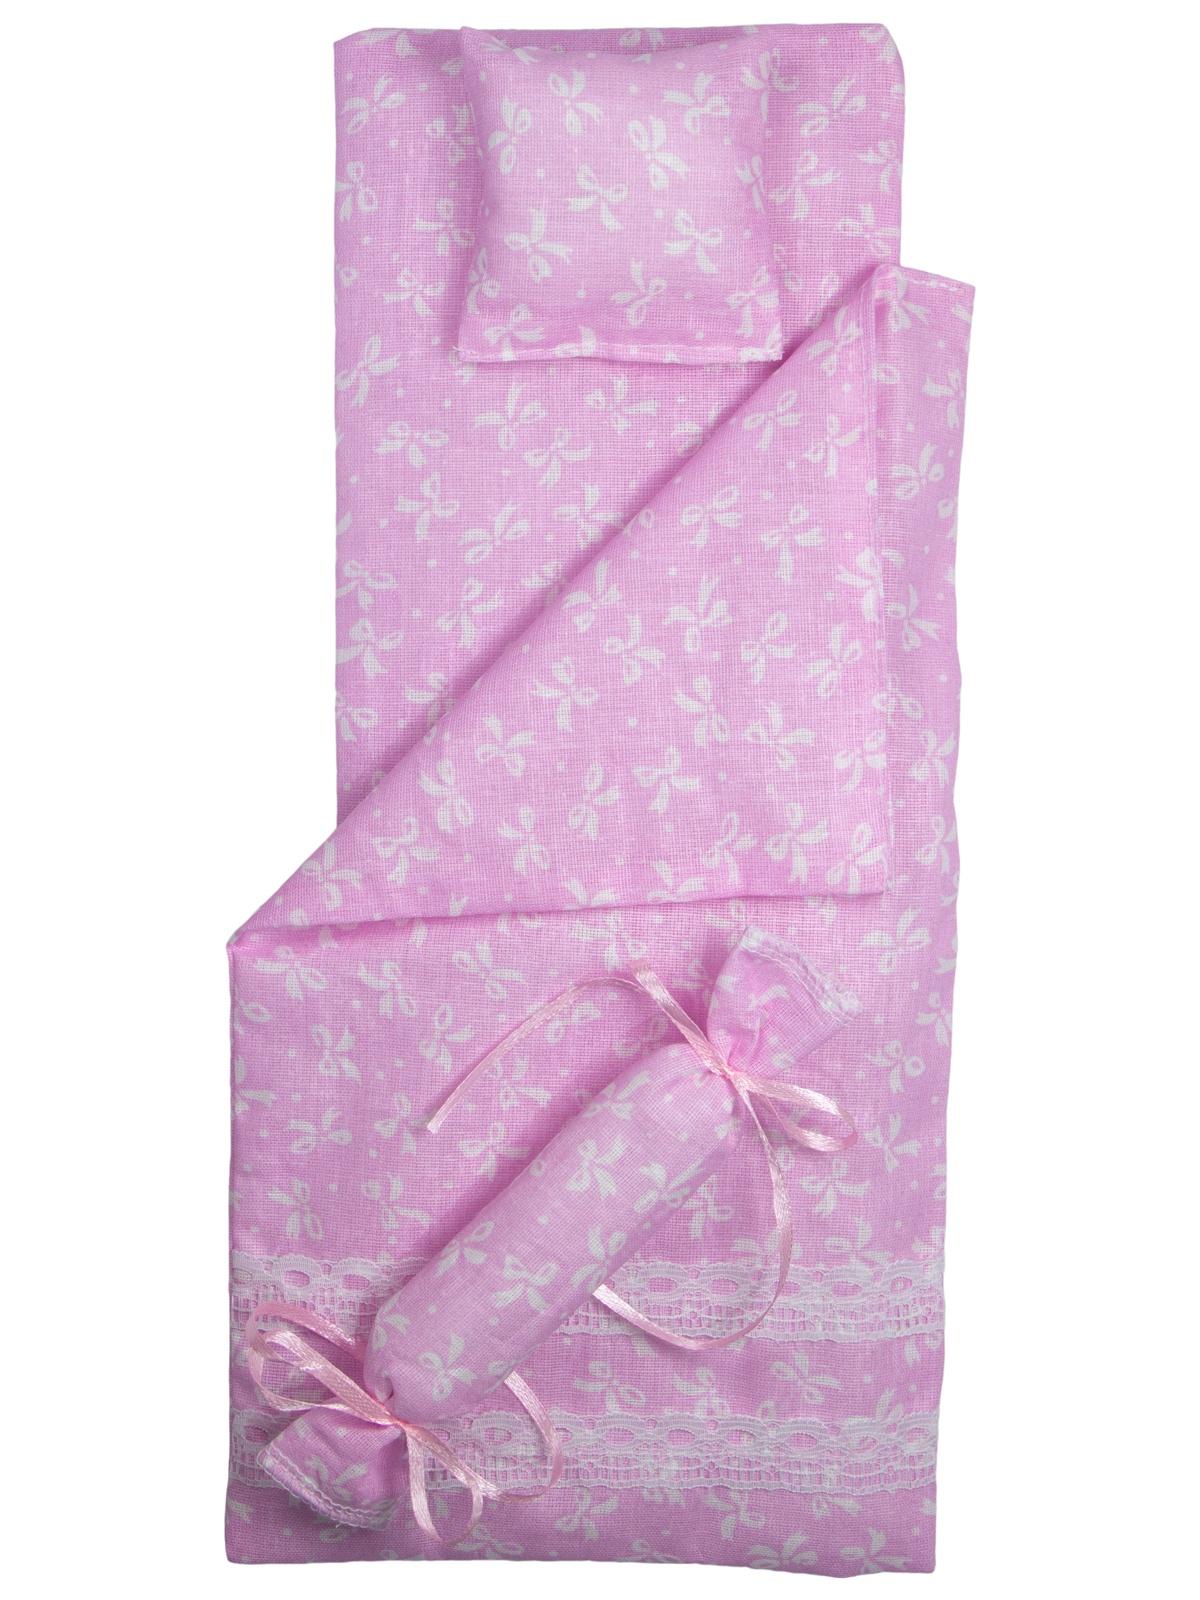 Одежда для кукол Модница Набор для сна для кукол 29 см розовый